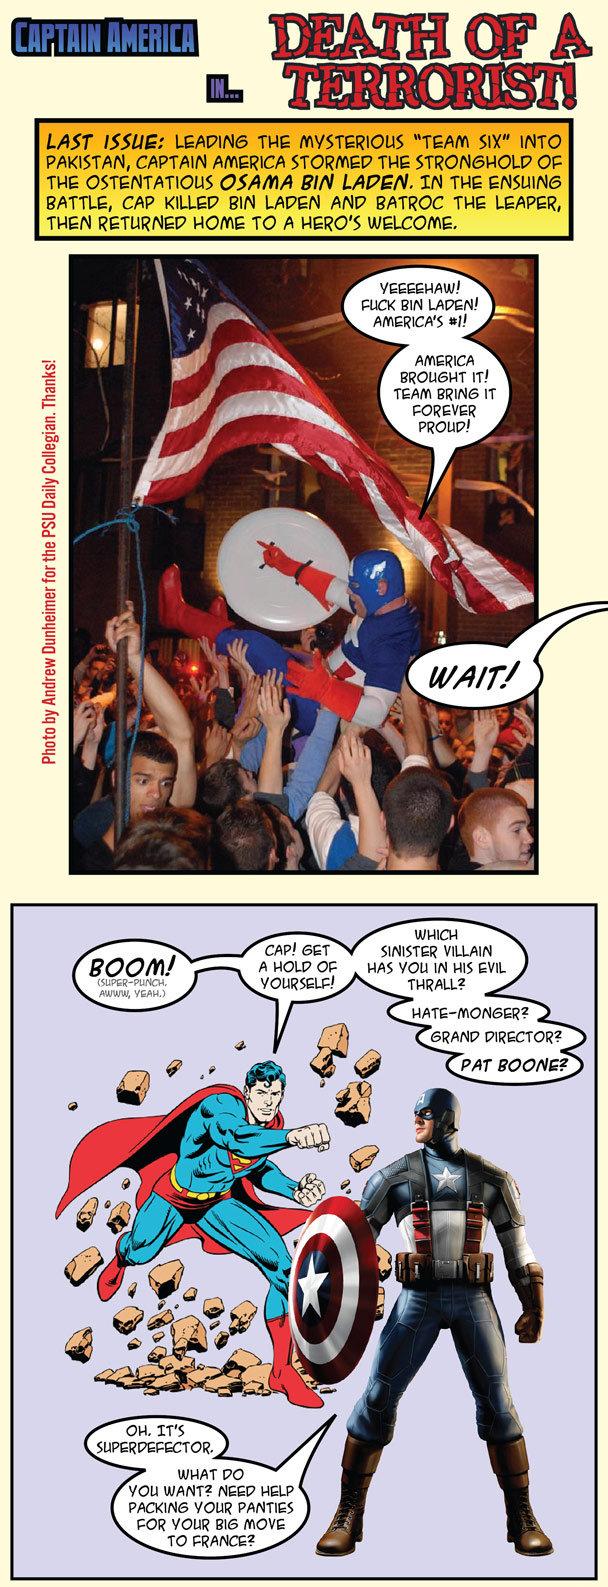 Superman & Captain America ponder bin Laden's death